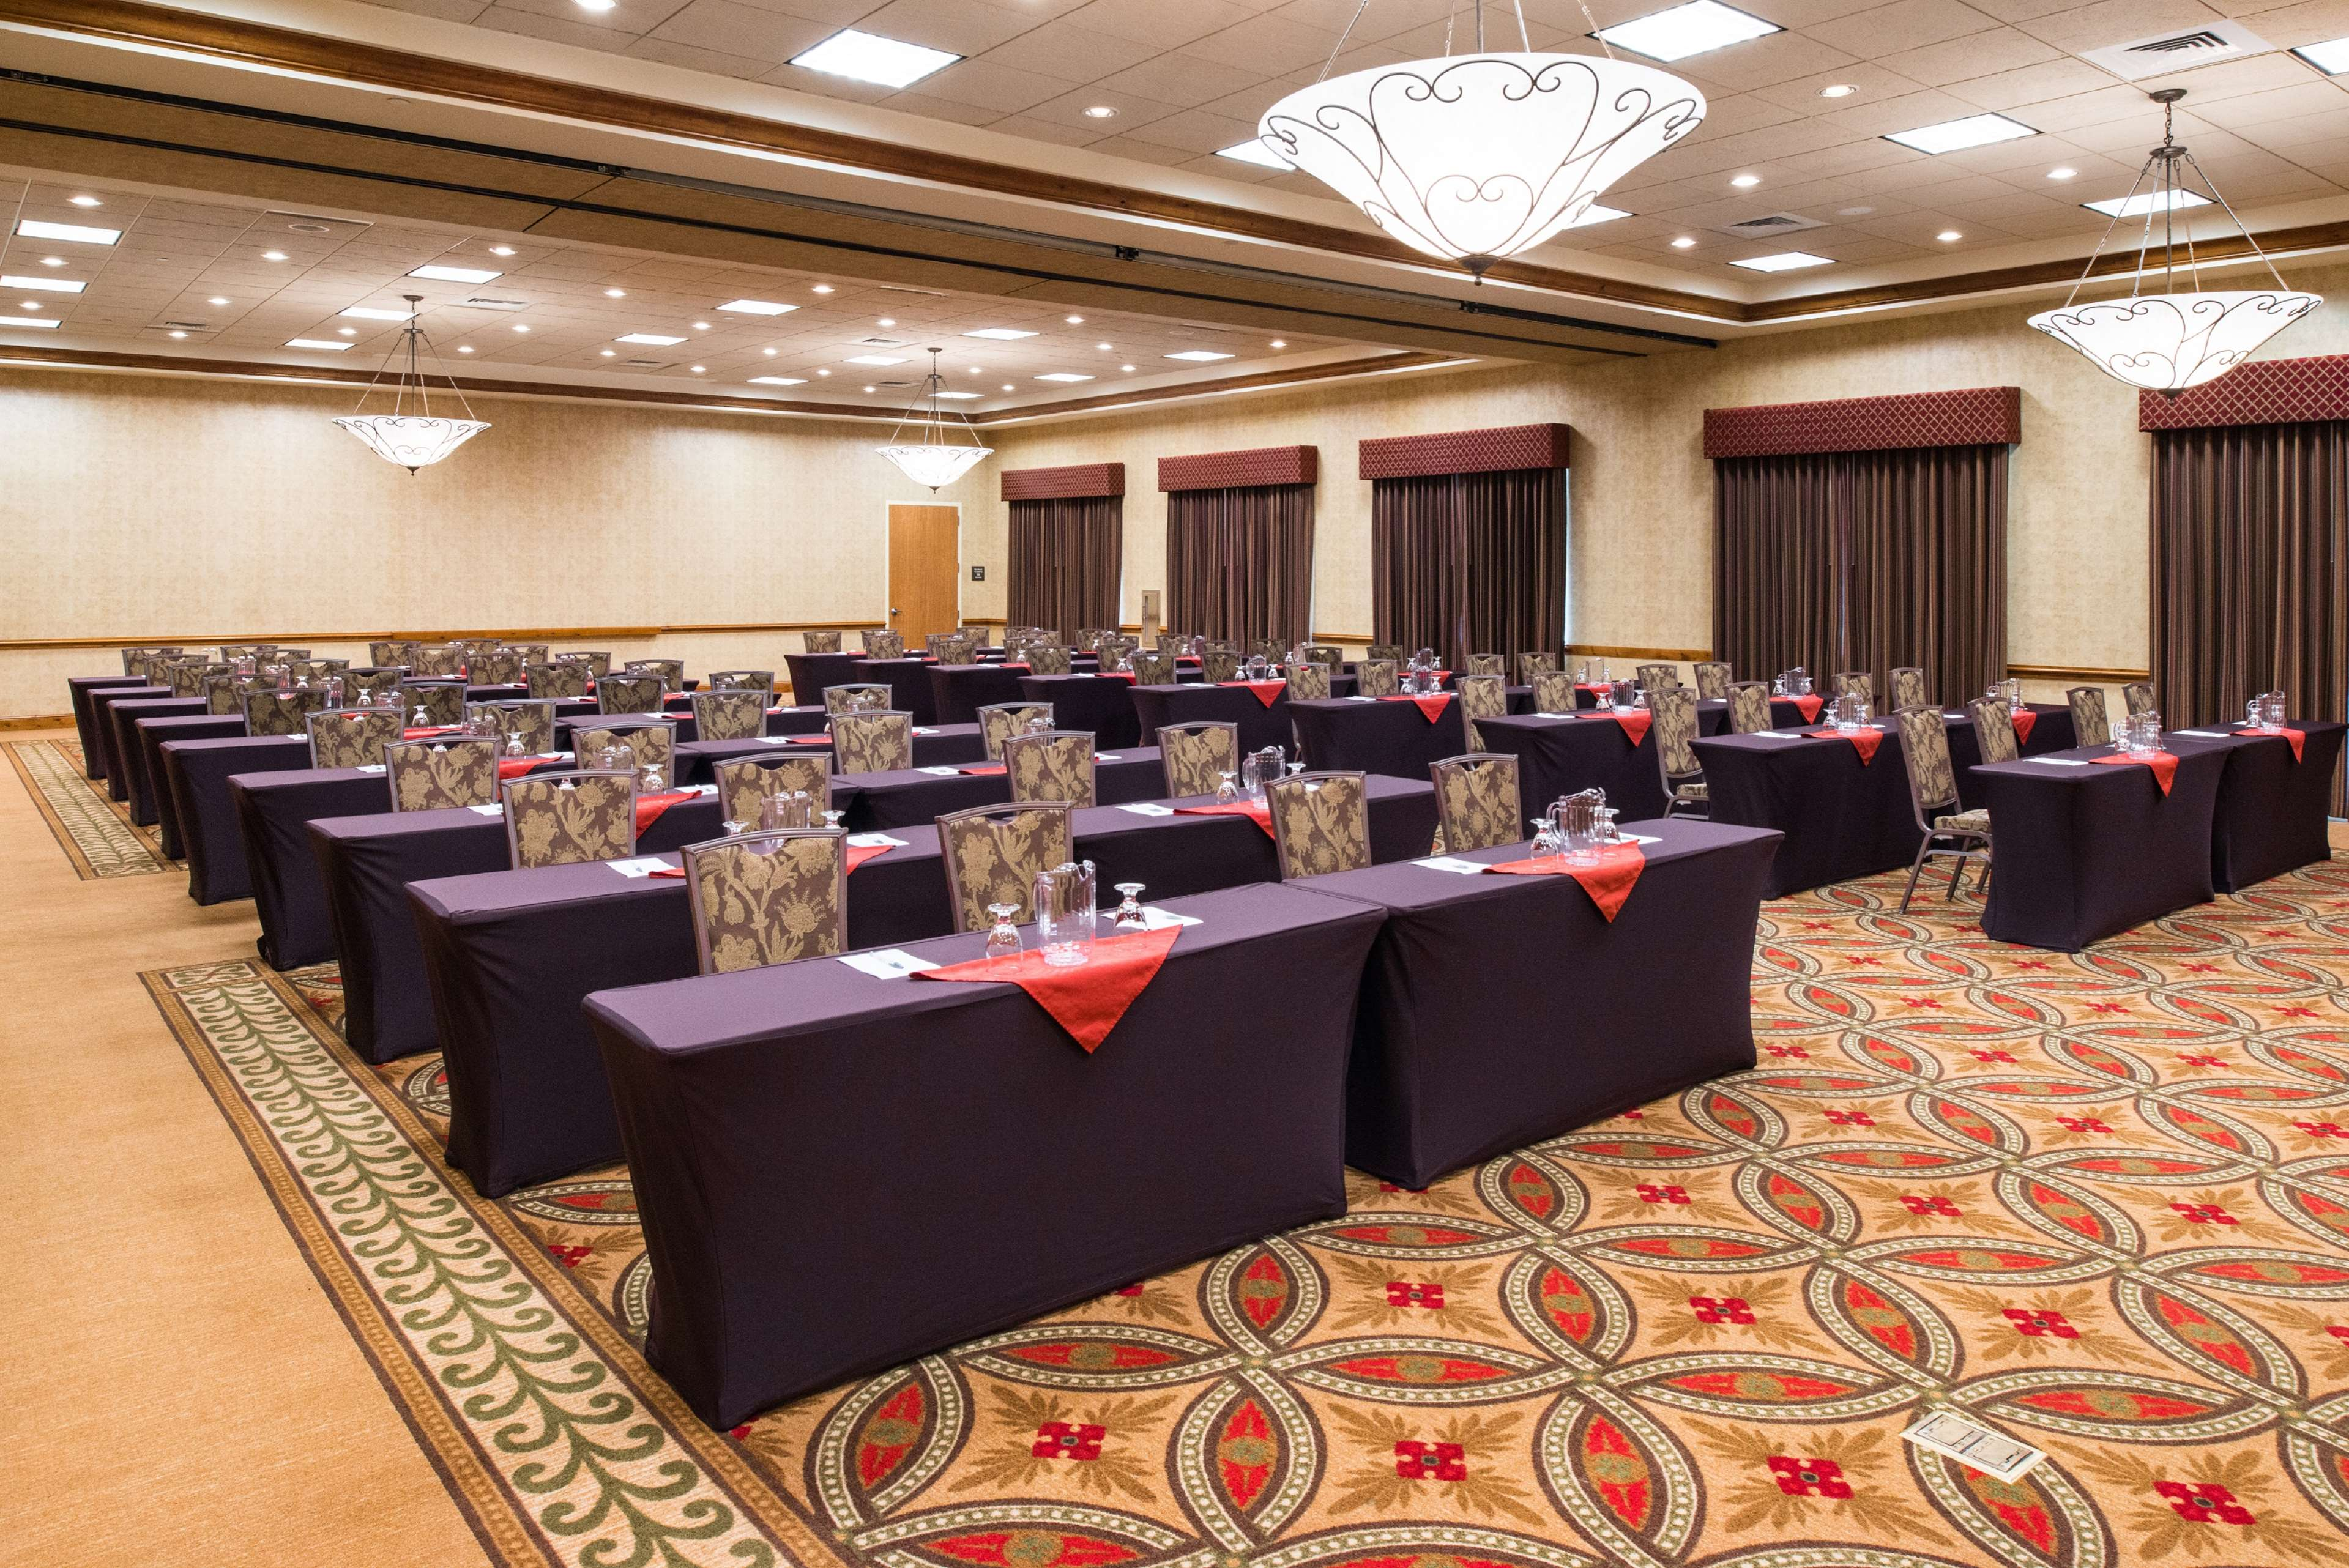 Hampton Inn & Suites Coeur d' Alene image 29